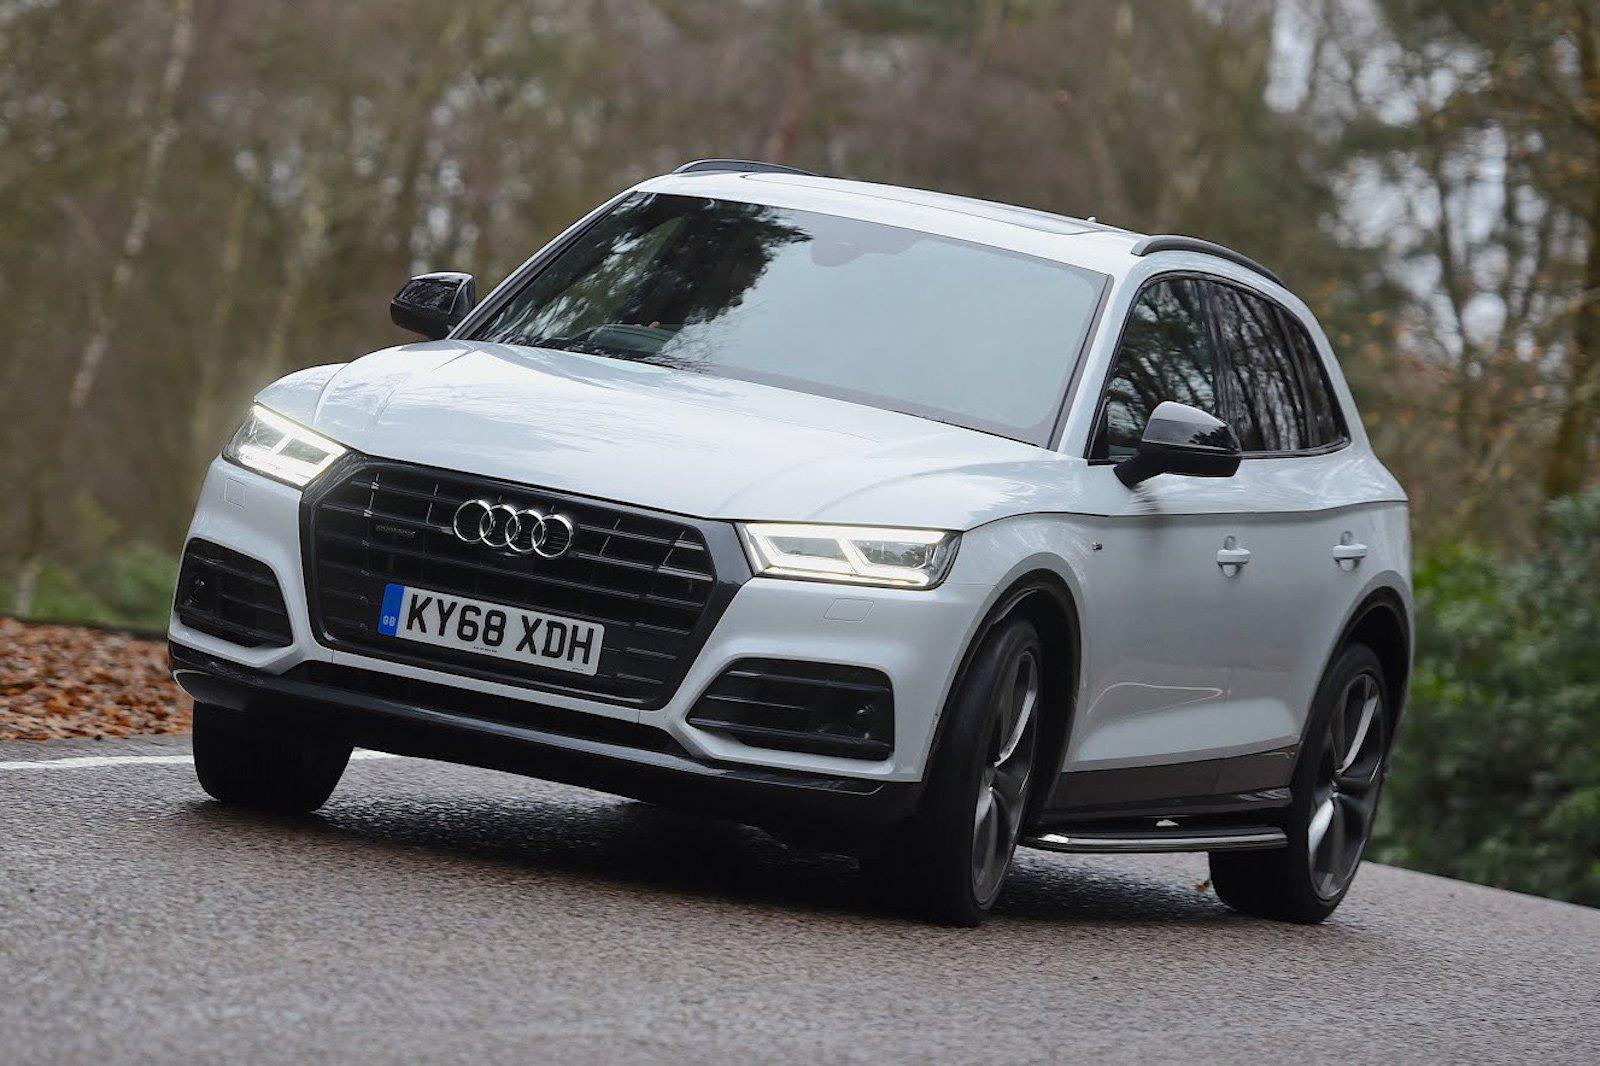 Audi A5 Vorsprung Header Handling